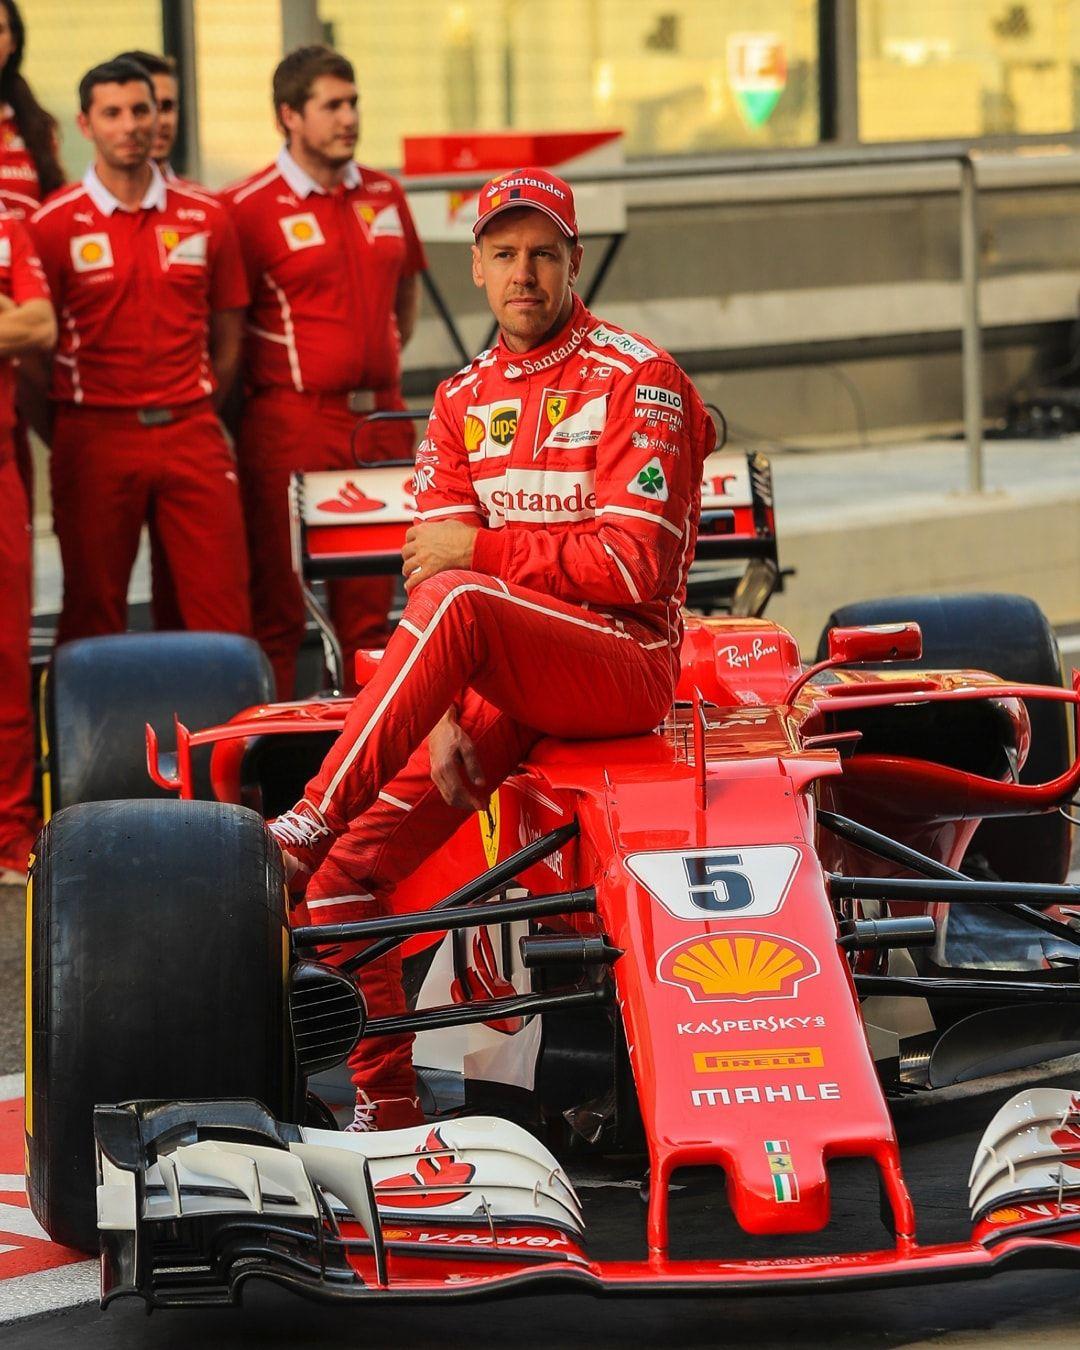 Pin By Rogersautocycle On Racing Drivers In 2020 Ferrari F1 Ferrari Ferrari Scuderia